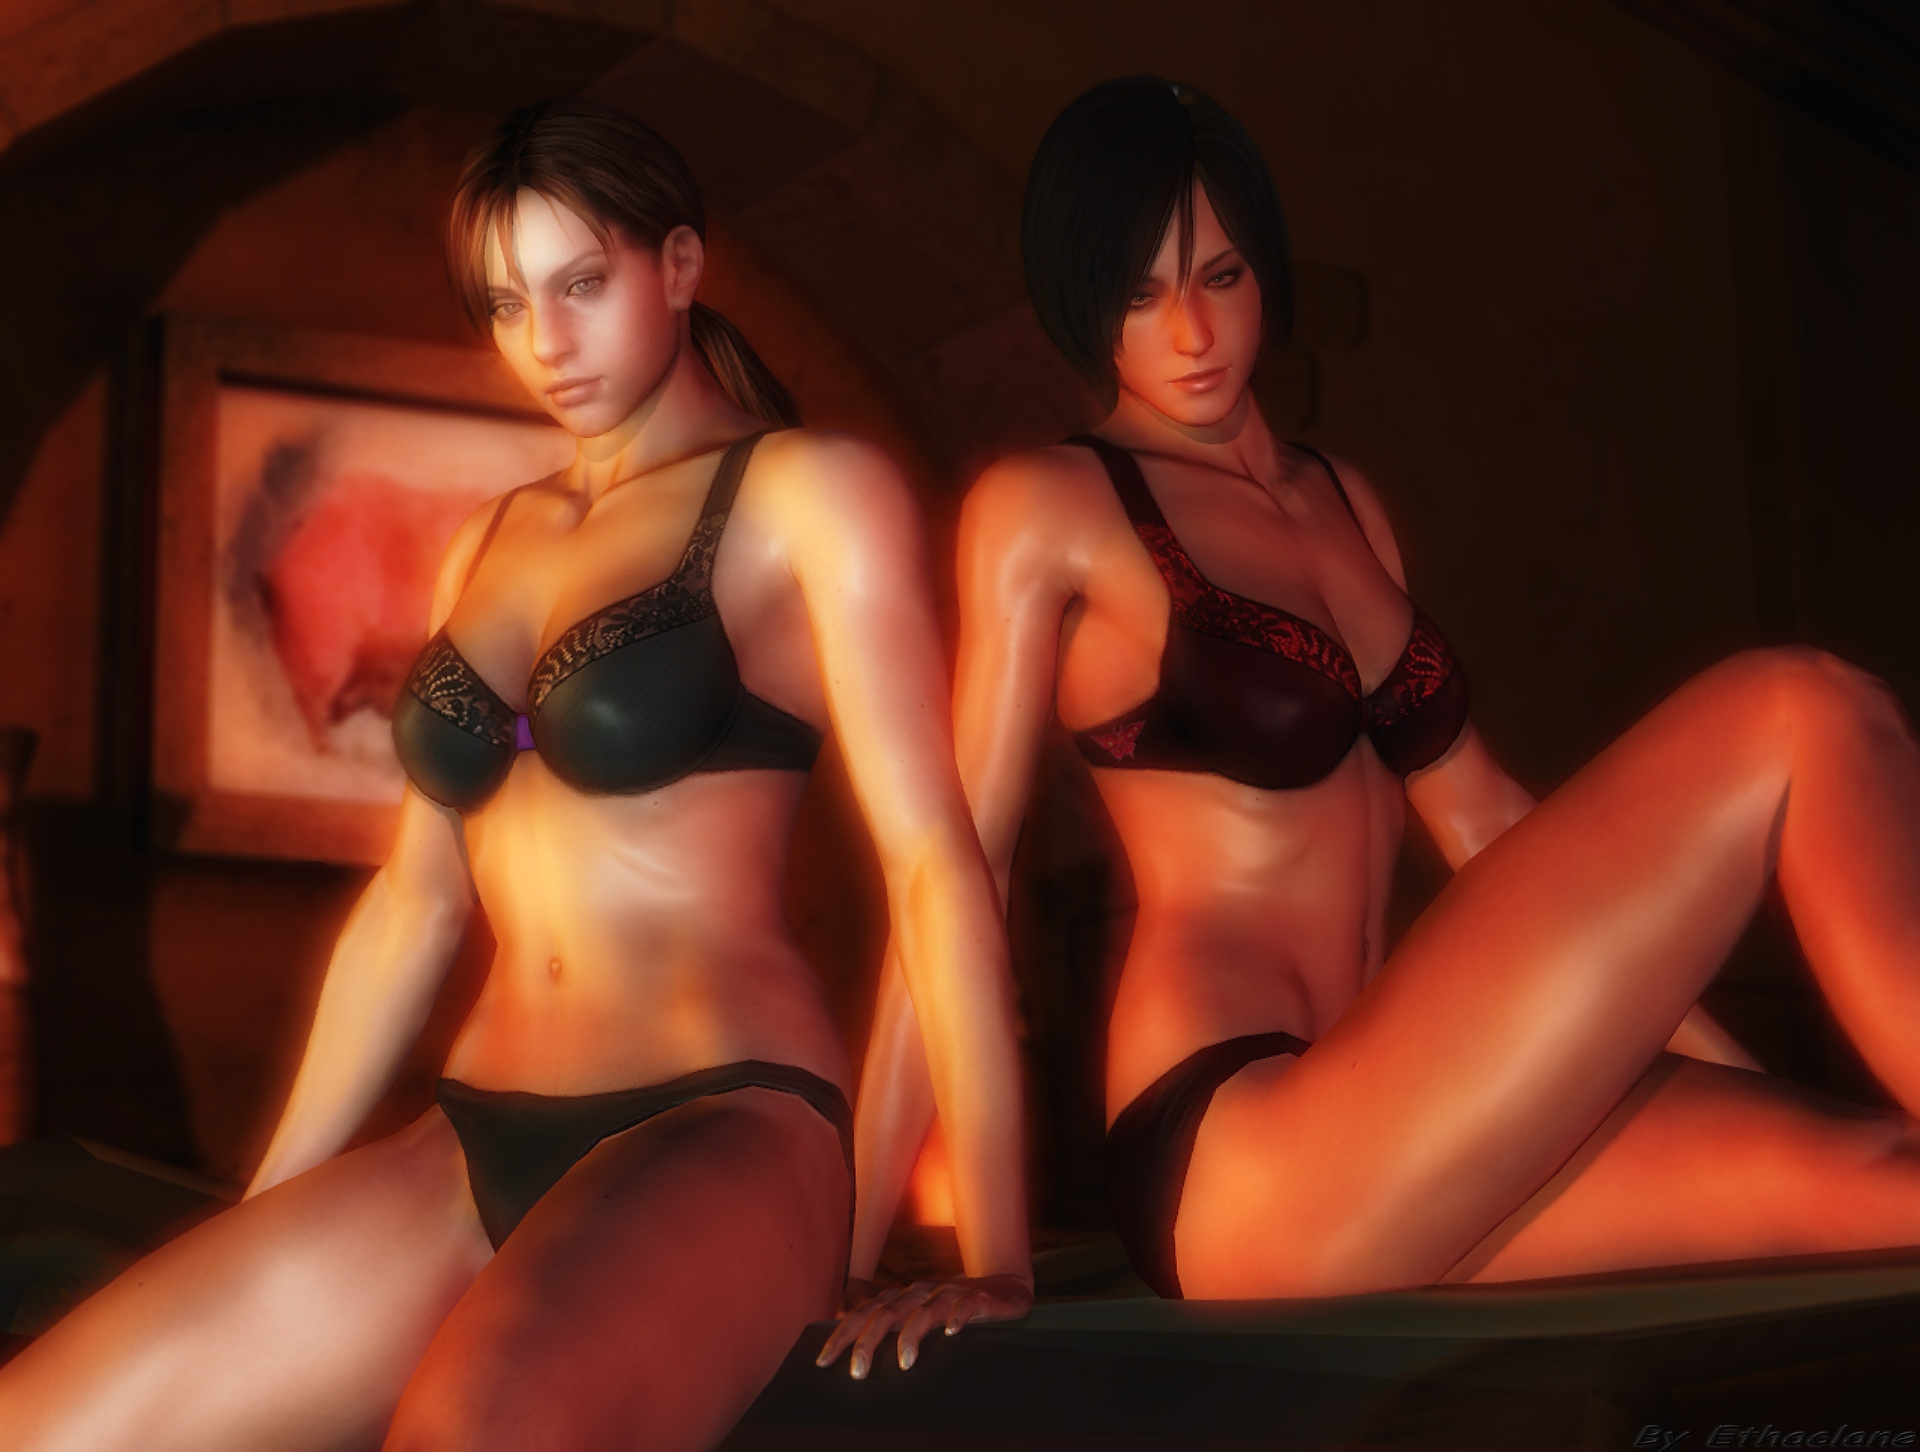 Ada wong hentai pic naked video